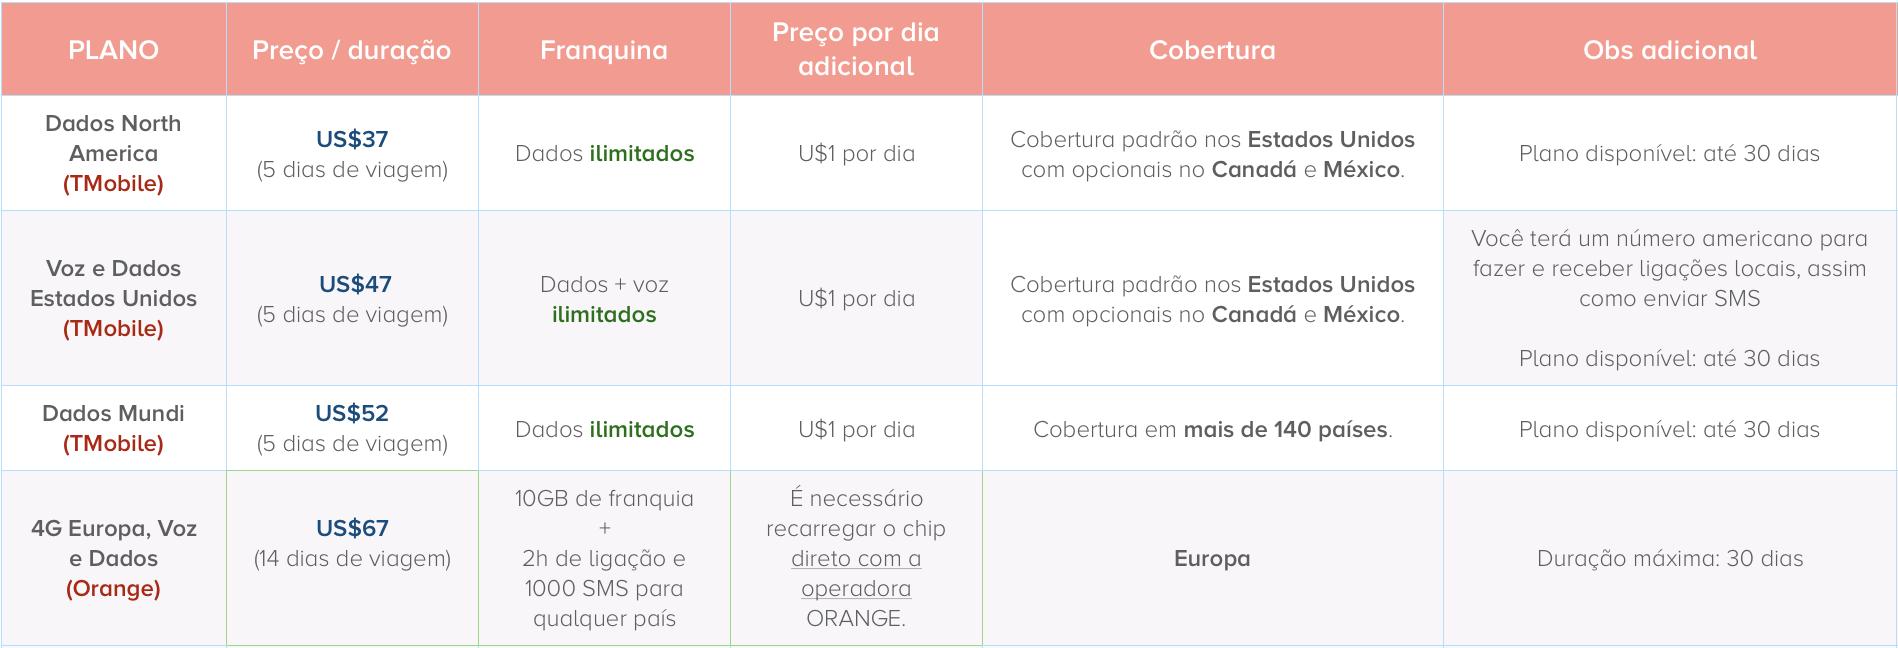 easysim4u: tabela de preços